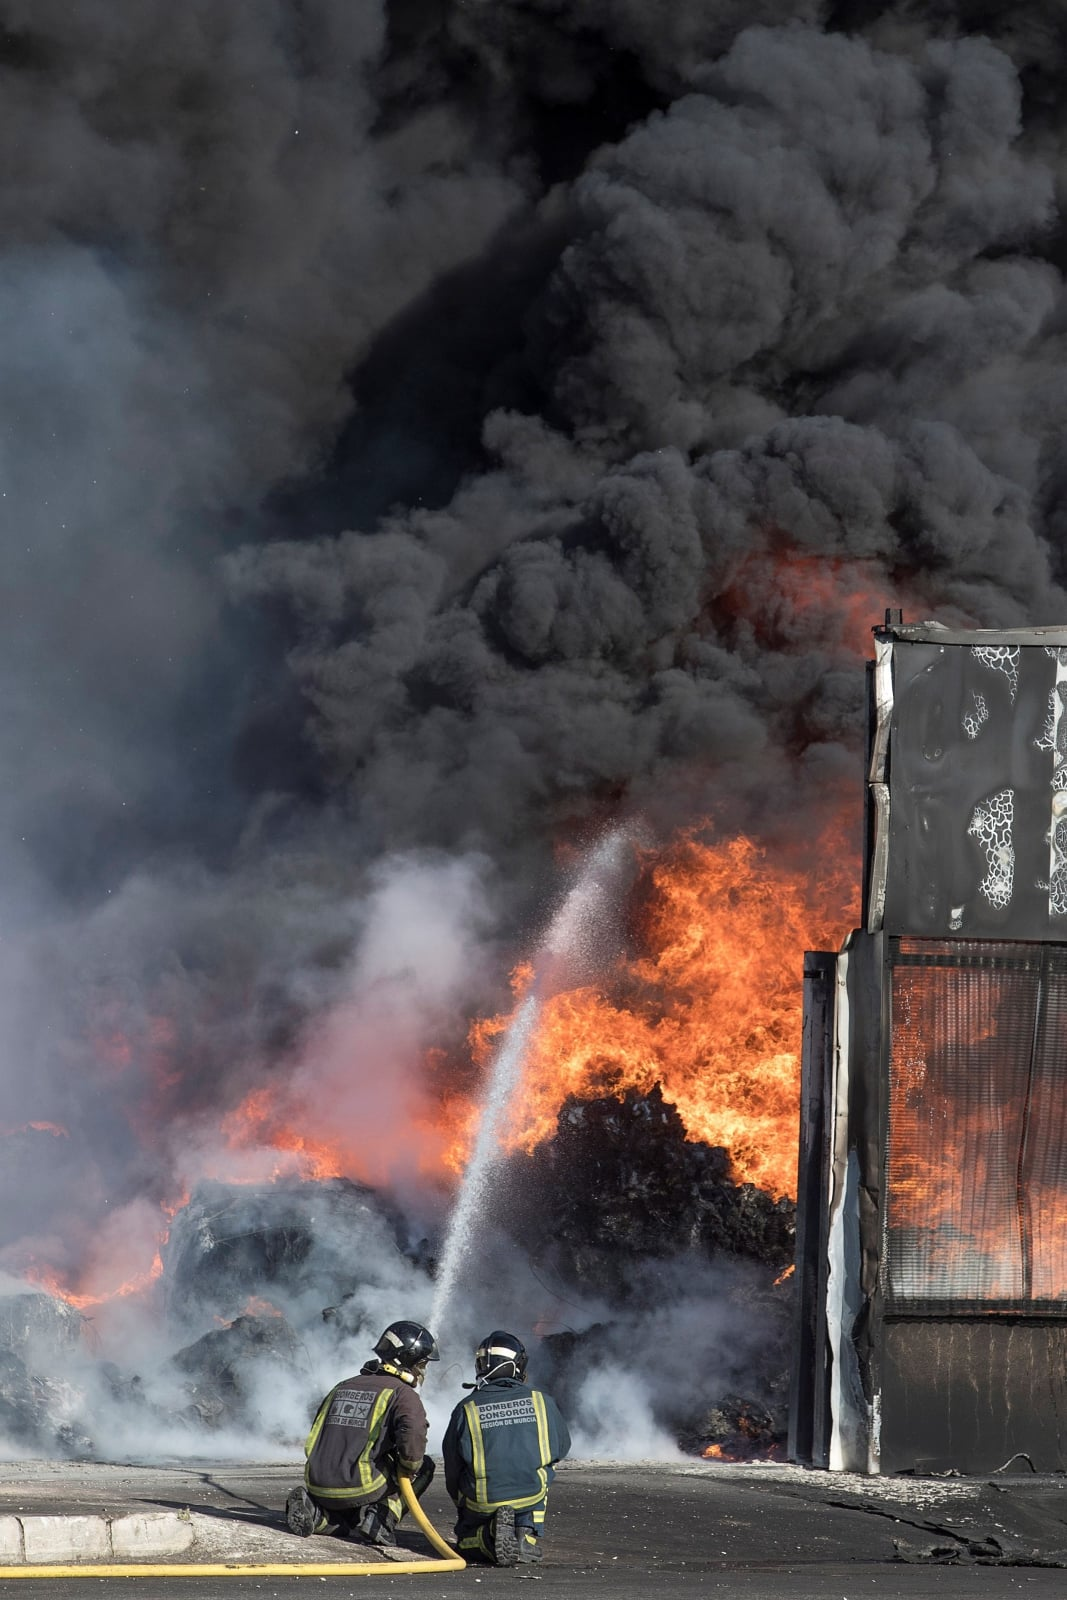 Pożar w Hiszpanii fot. EPA/Marcial Guillén